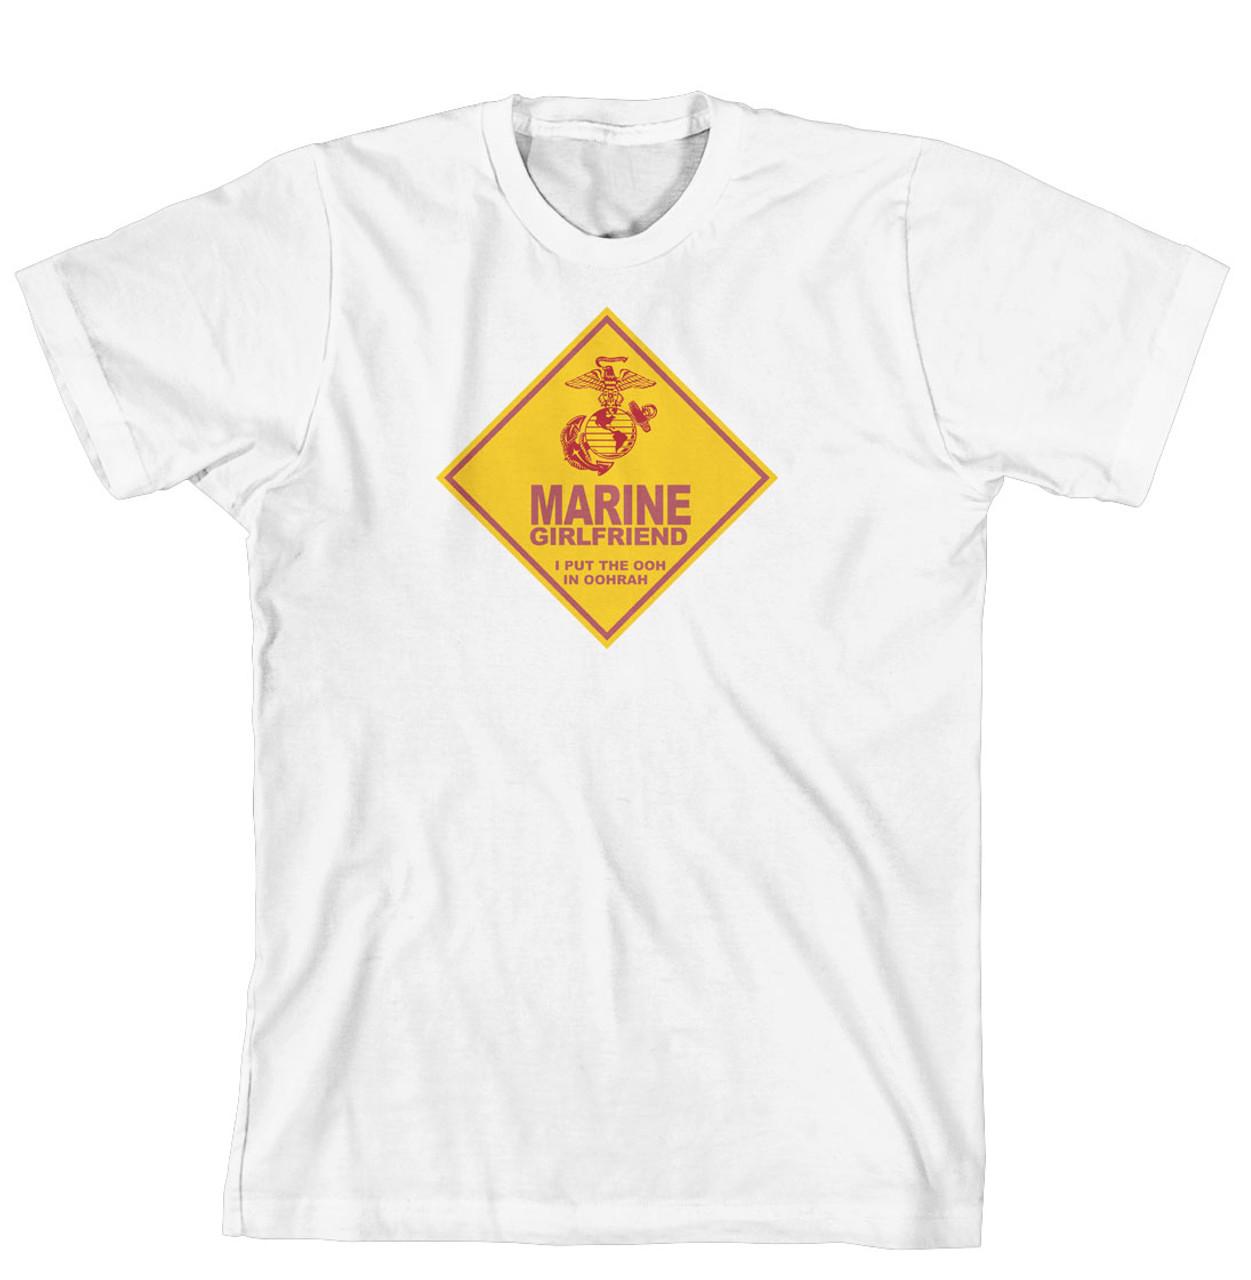 T-Shirt - Marine Girlfriend. I put the Ooh in Hoorah (170-